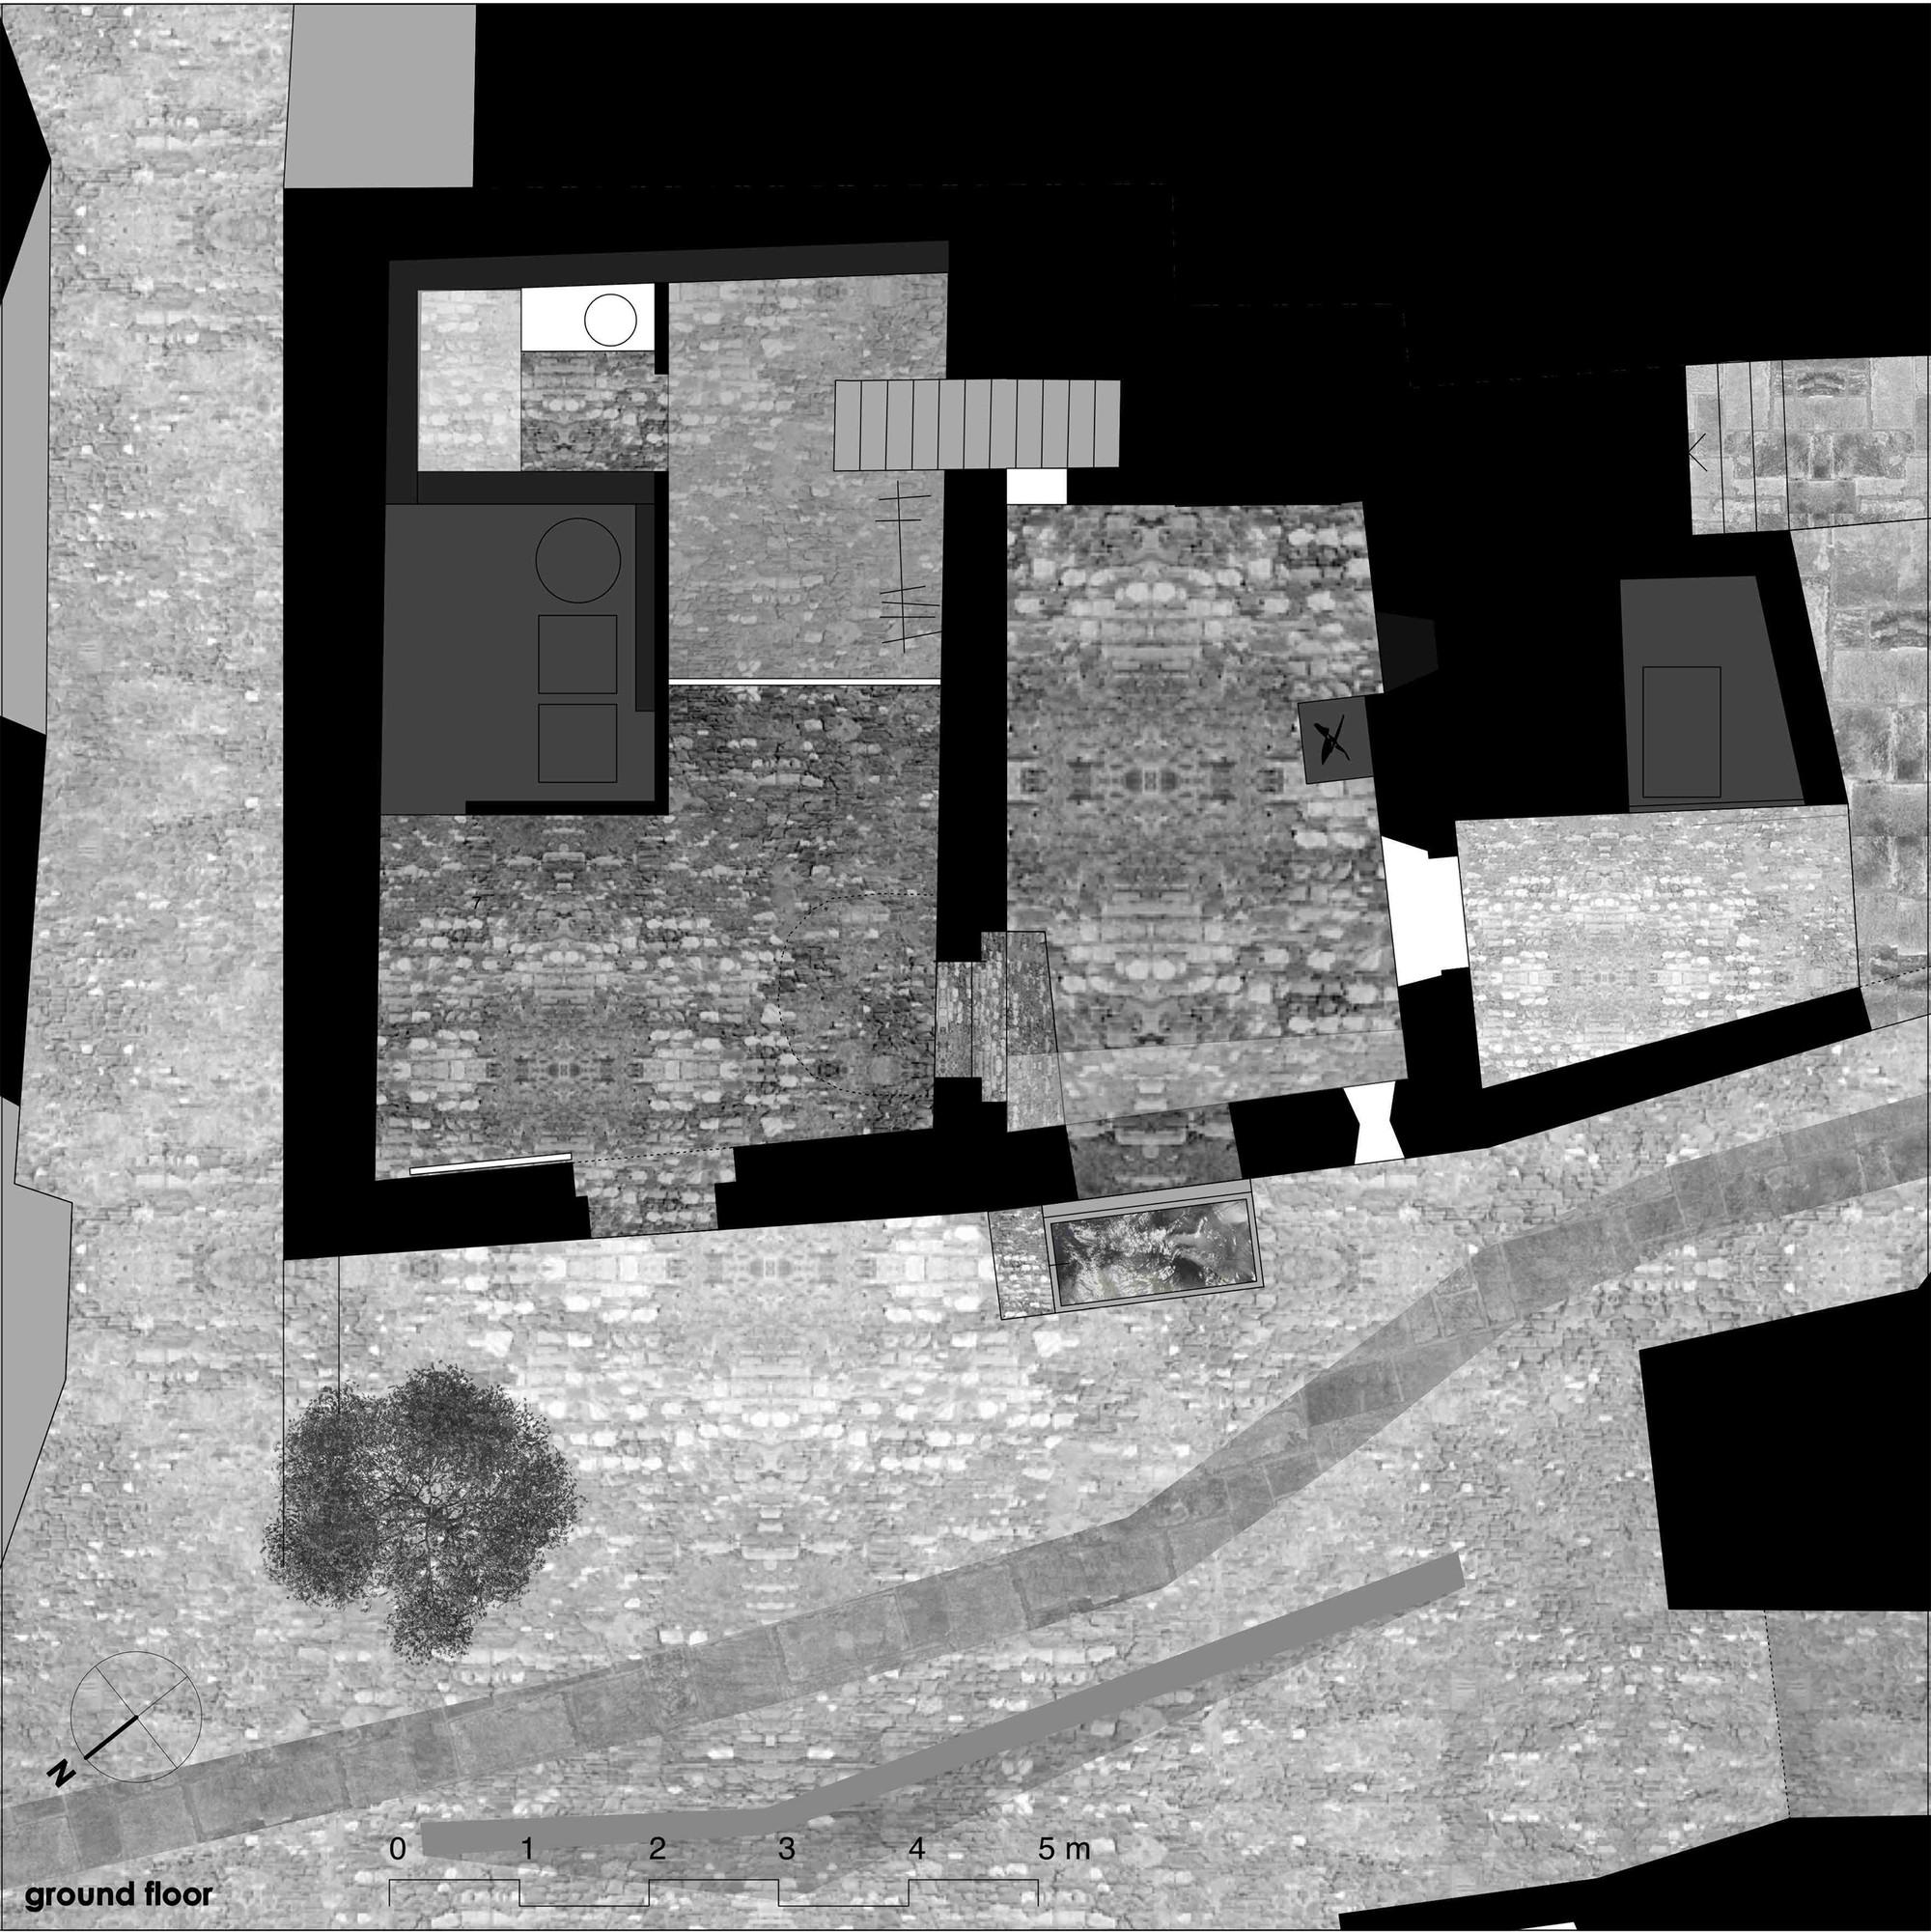 Gallery of Stone House Transformation in Scaiano Wespi de Meuron